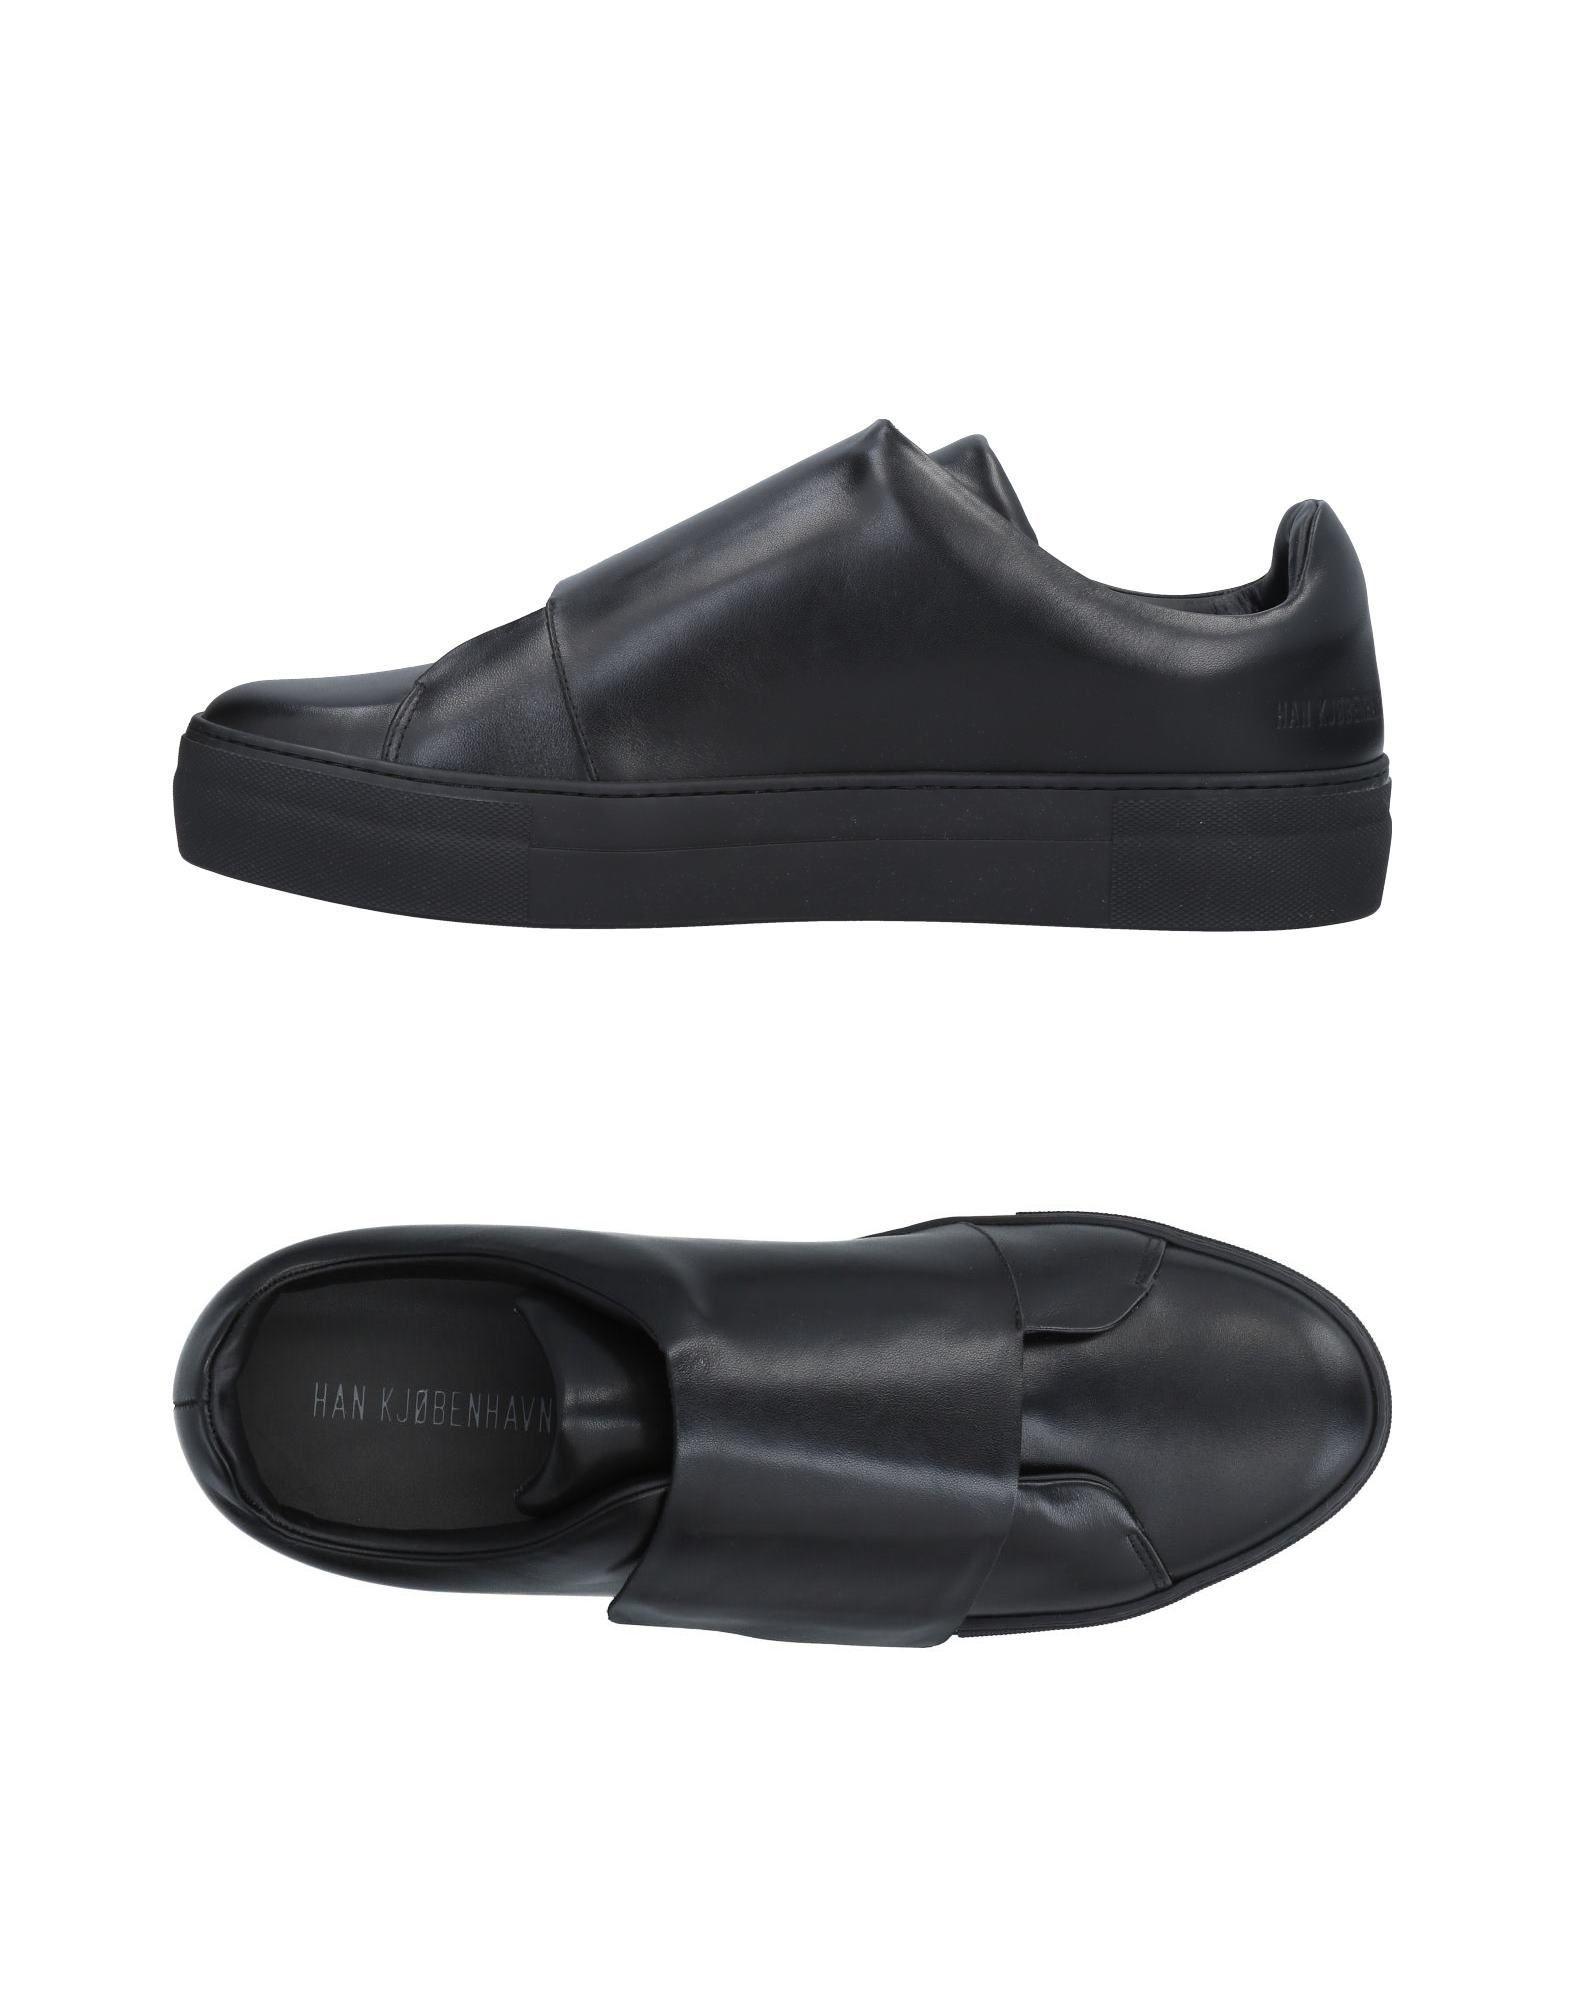 Sneakers Han Kj benhavn Uomo - 11478269KE